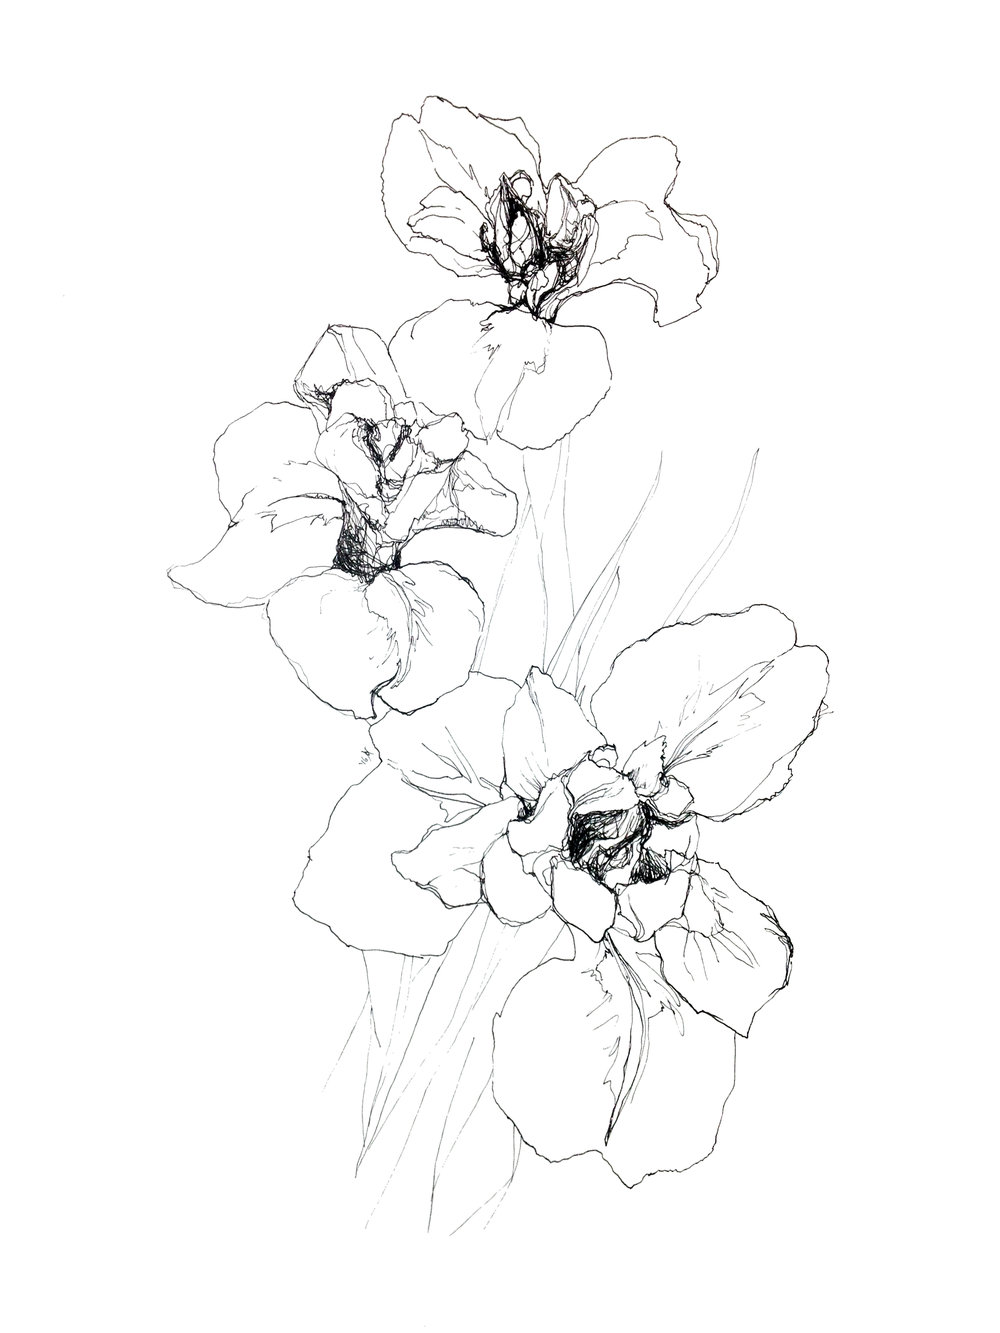 'Iris' ,Staedler pigment liner,450 x 320, 2016